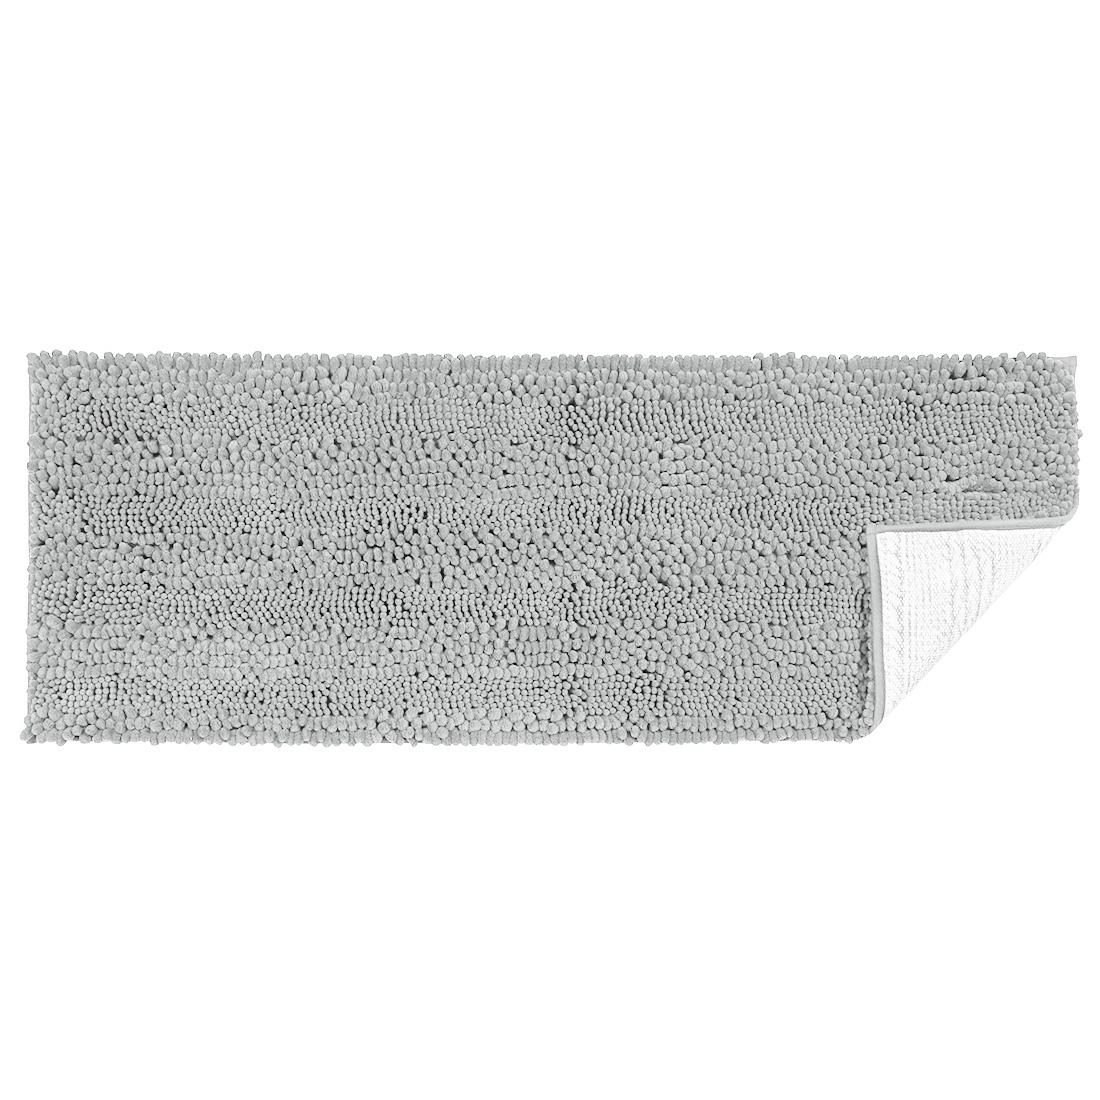 17 x 47 Inch Luxury Soft Plush Shaggy Bath Mat Chenille Rug Carpet Light Gray